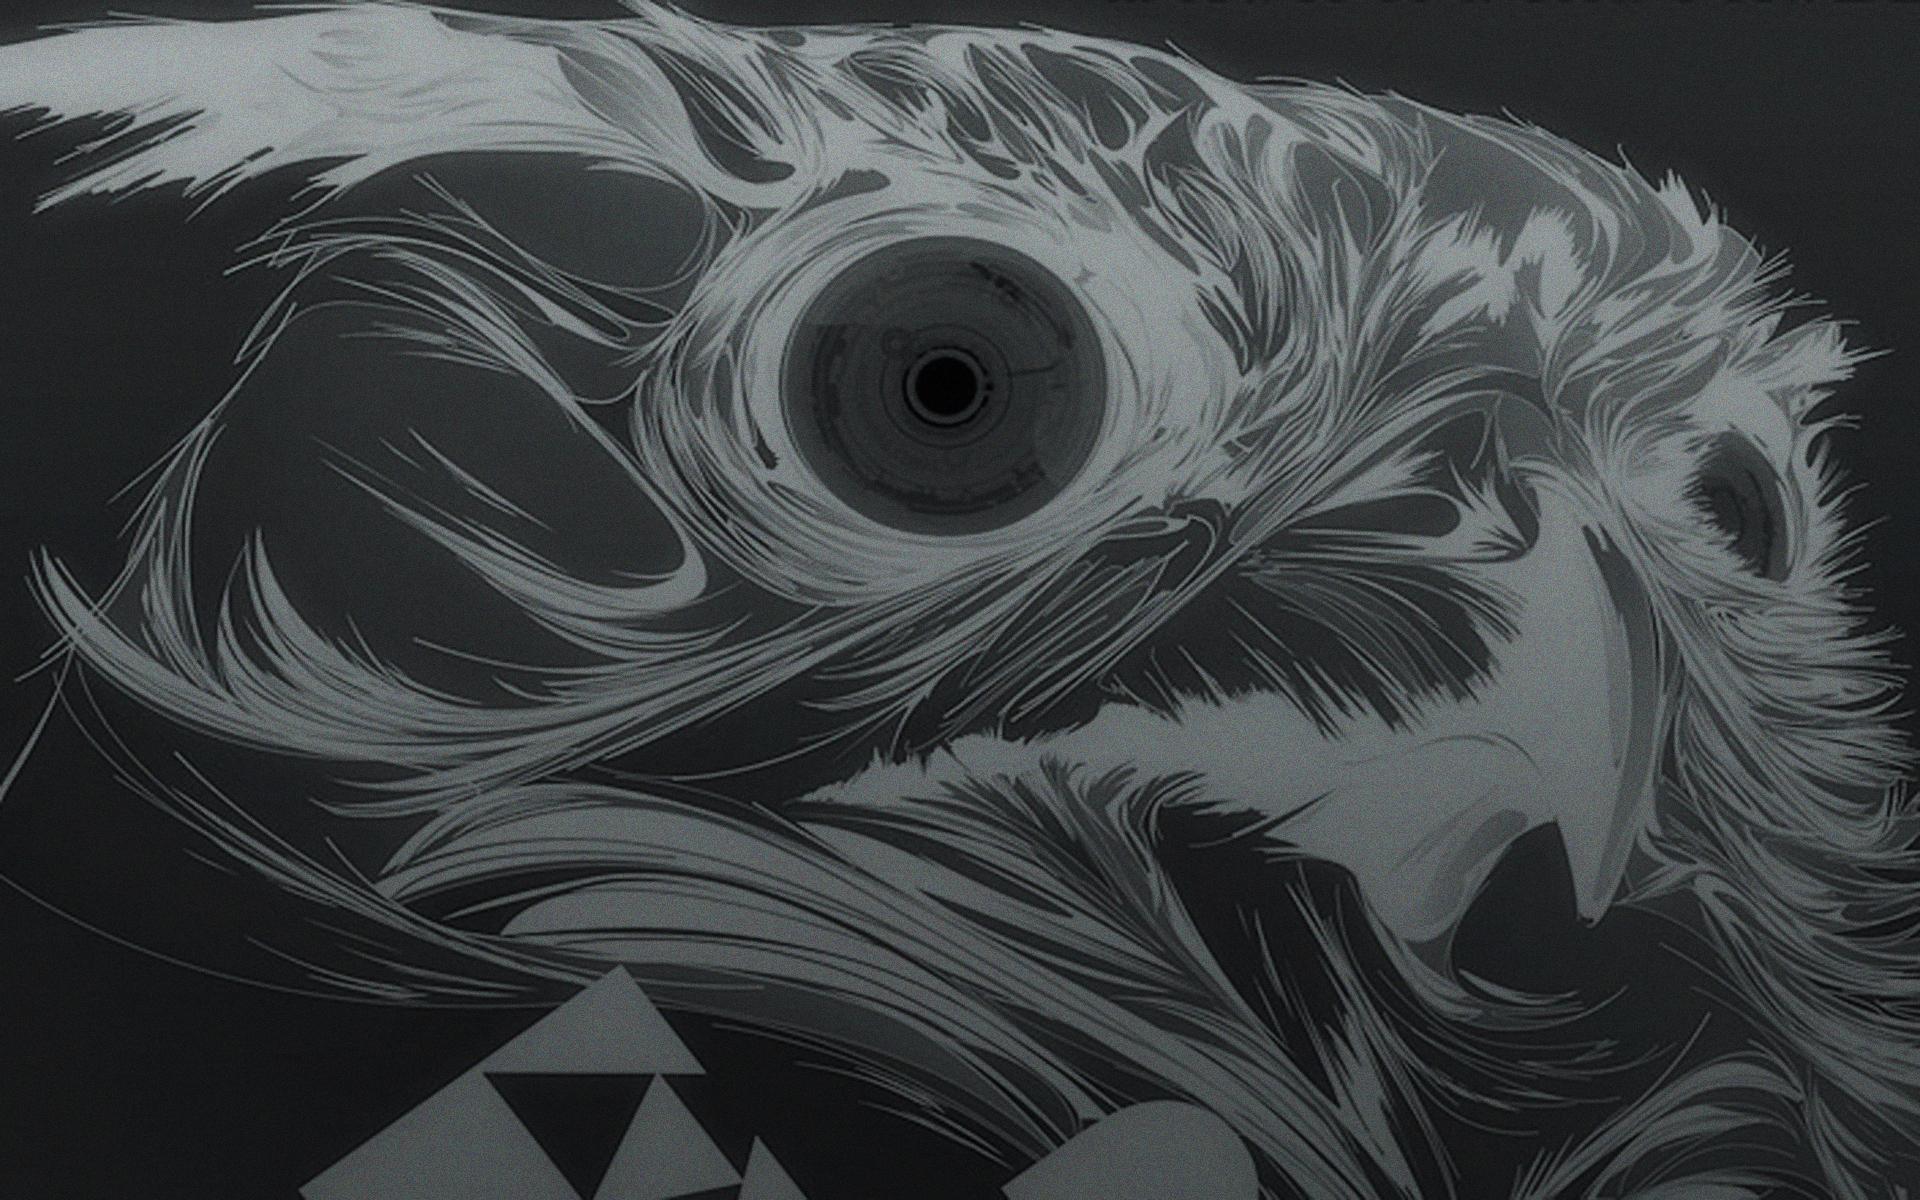 nightbird by nucu